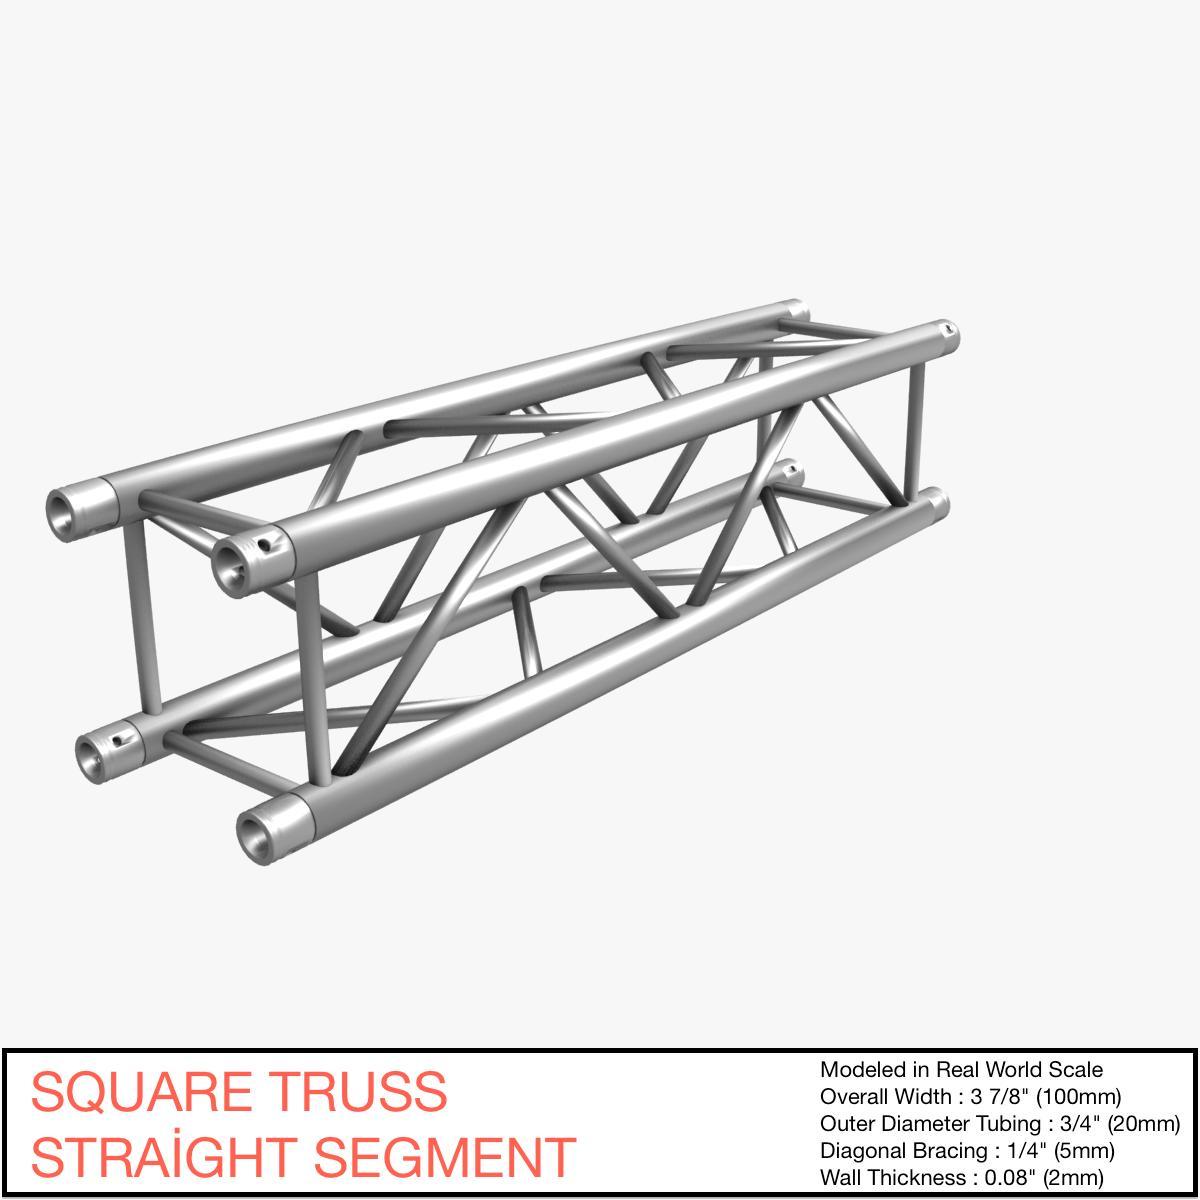 0-30-21-SquareTrussStraightSegment-21.jpg Download free STL file Square Truss Straight Segment 21 • 3D printable object, akerStudio